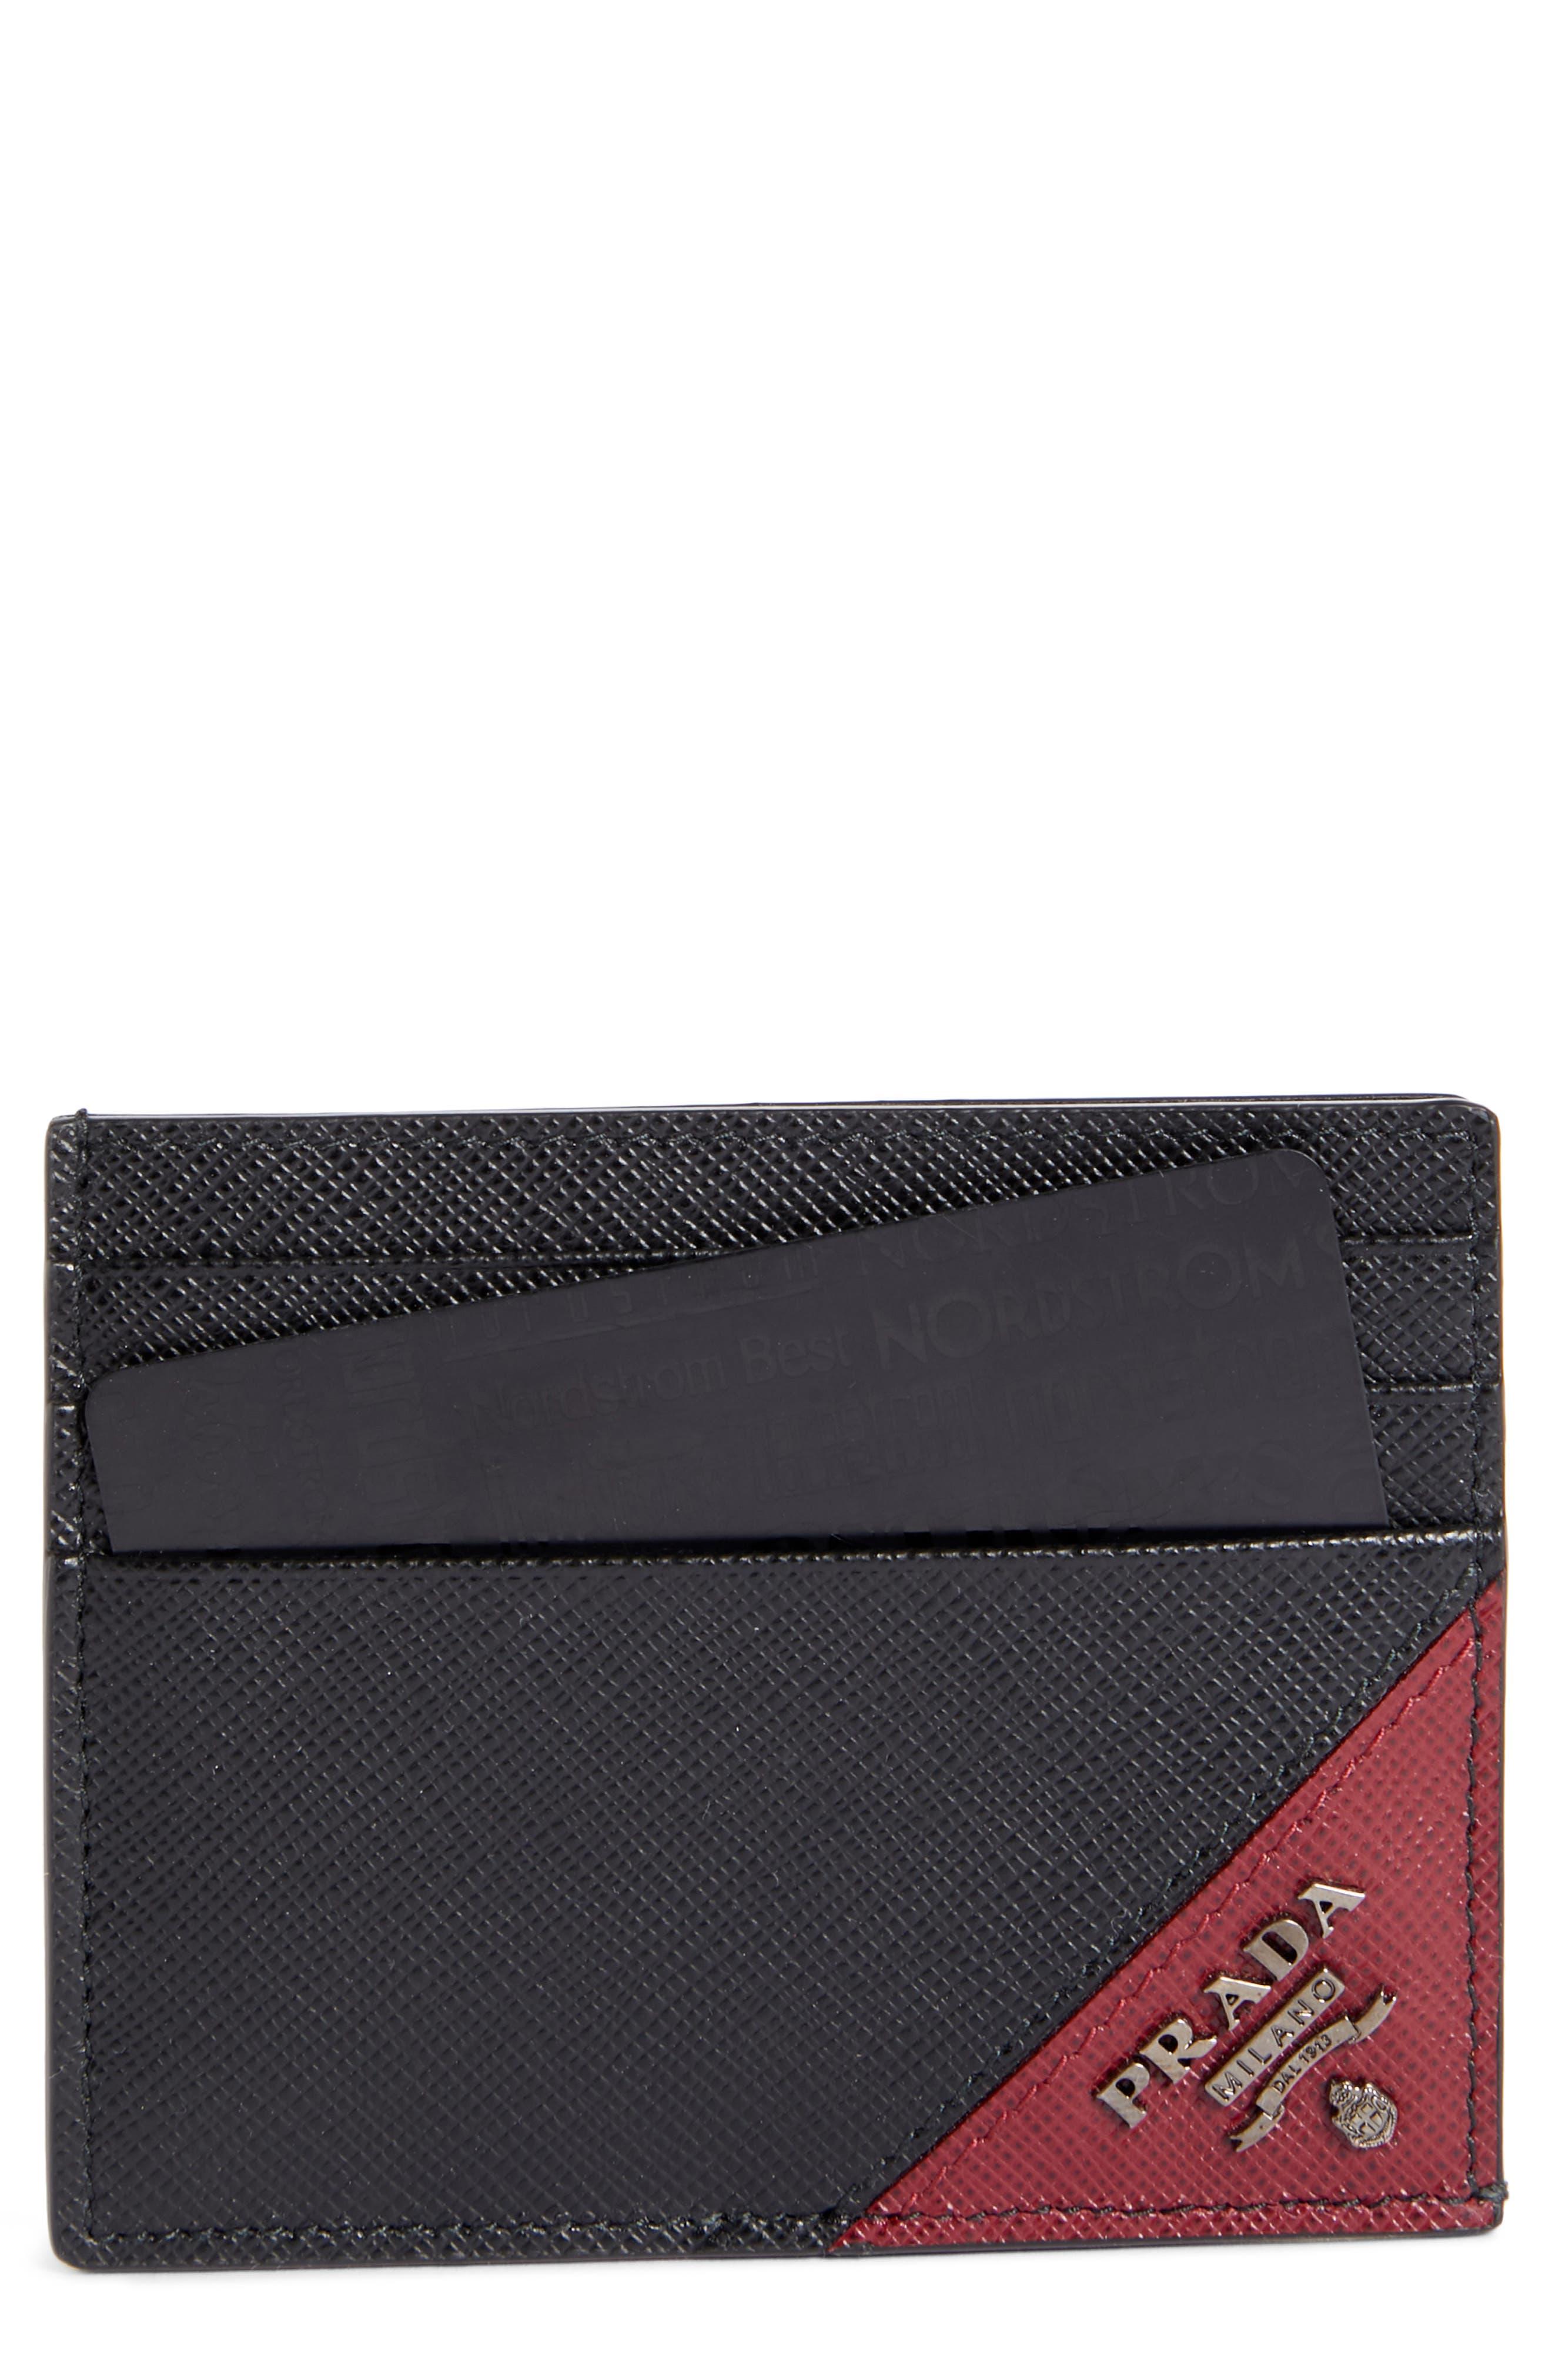 Saffiano Leather Card Case,                         Main,                         color, NERO AND CERISE